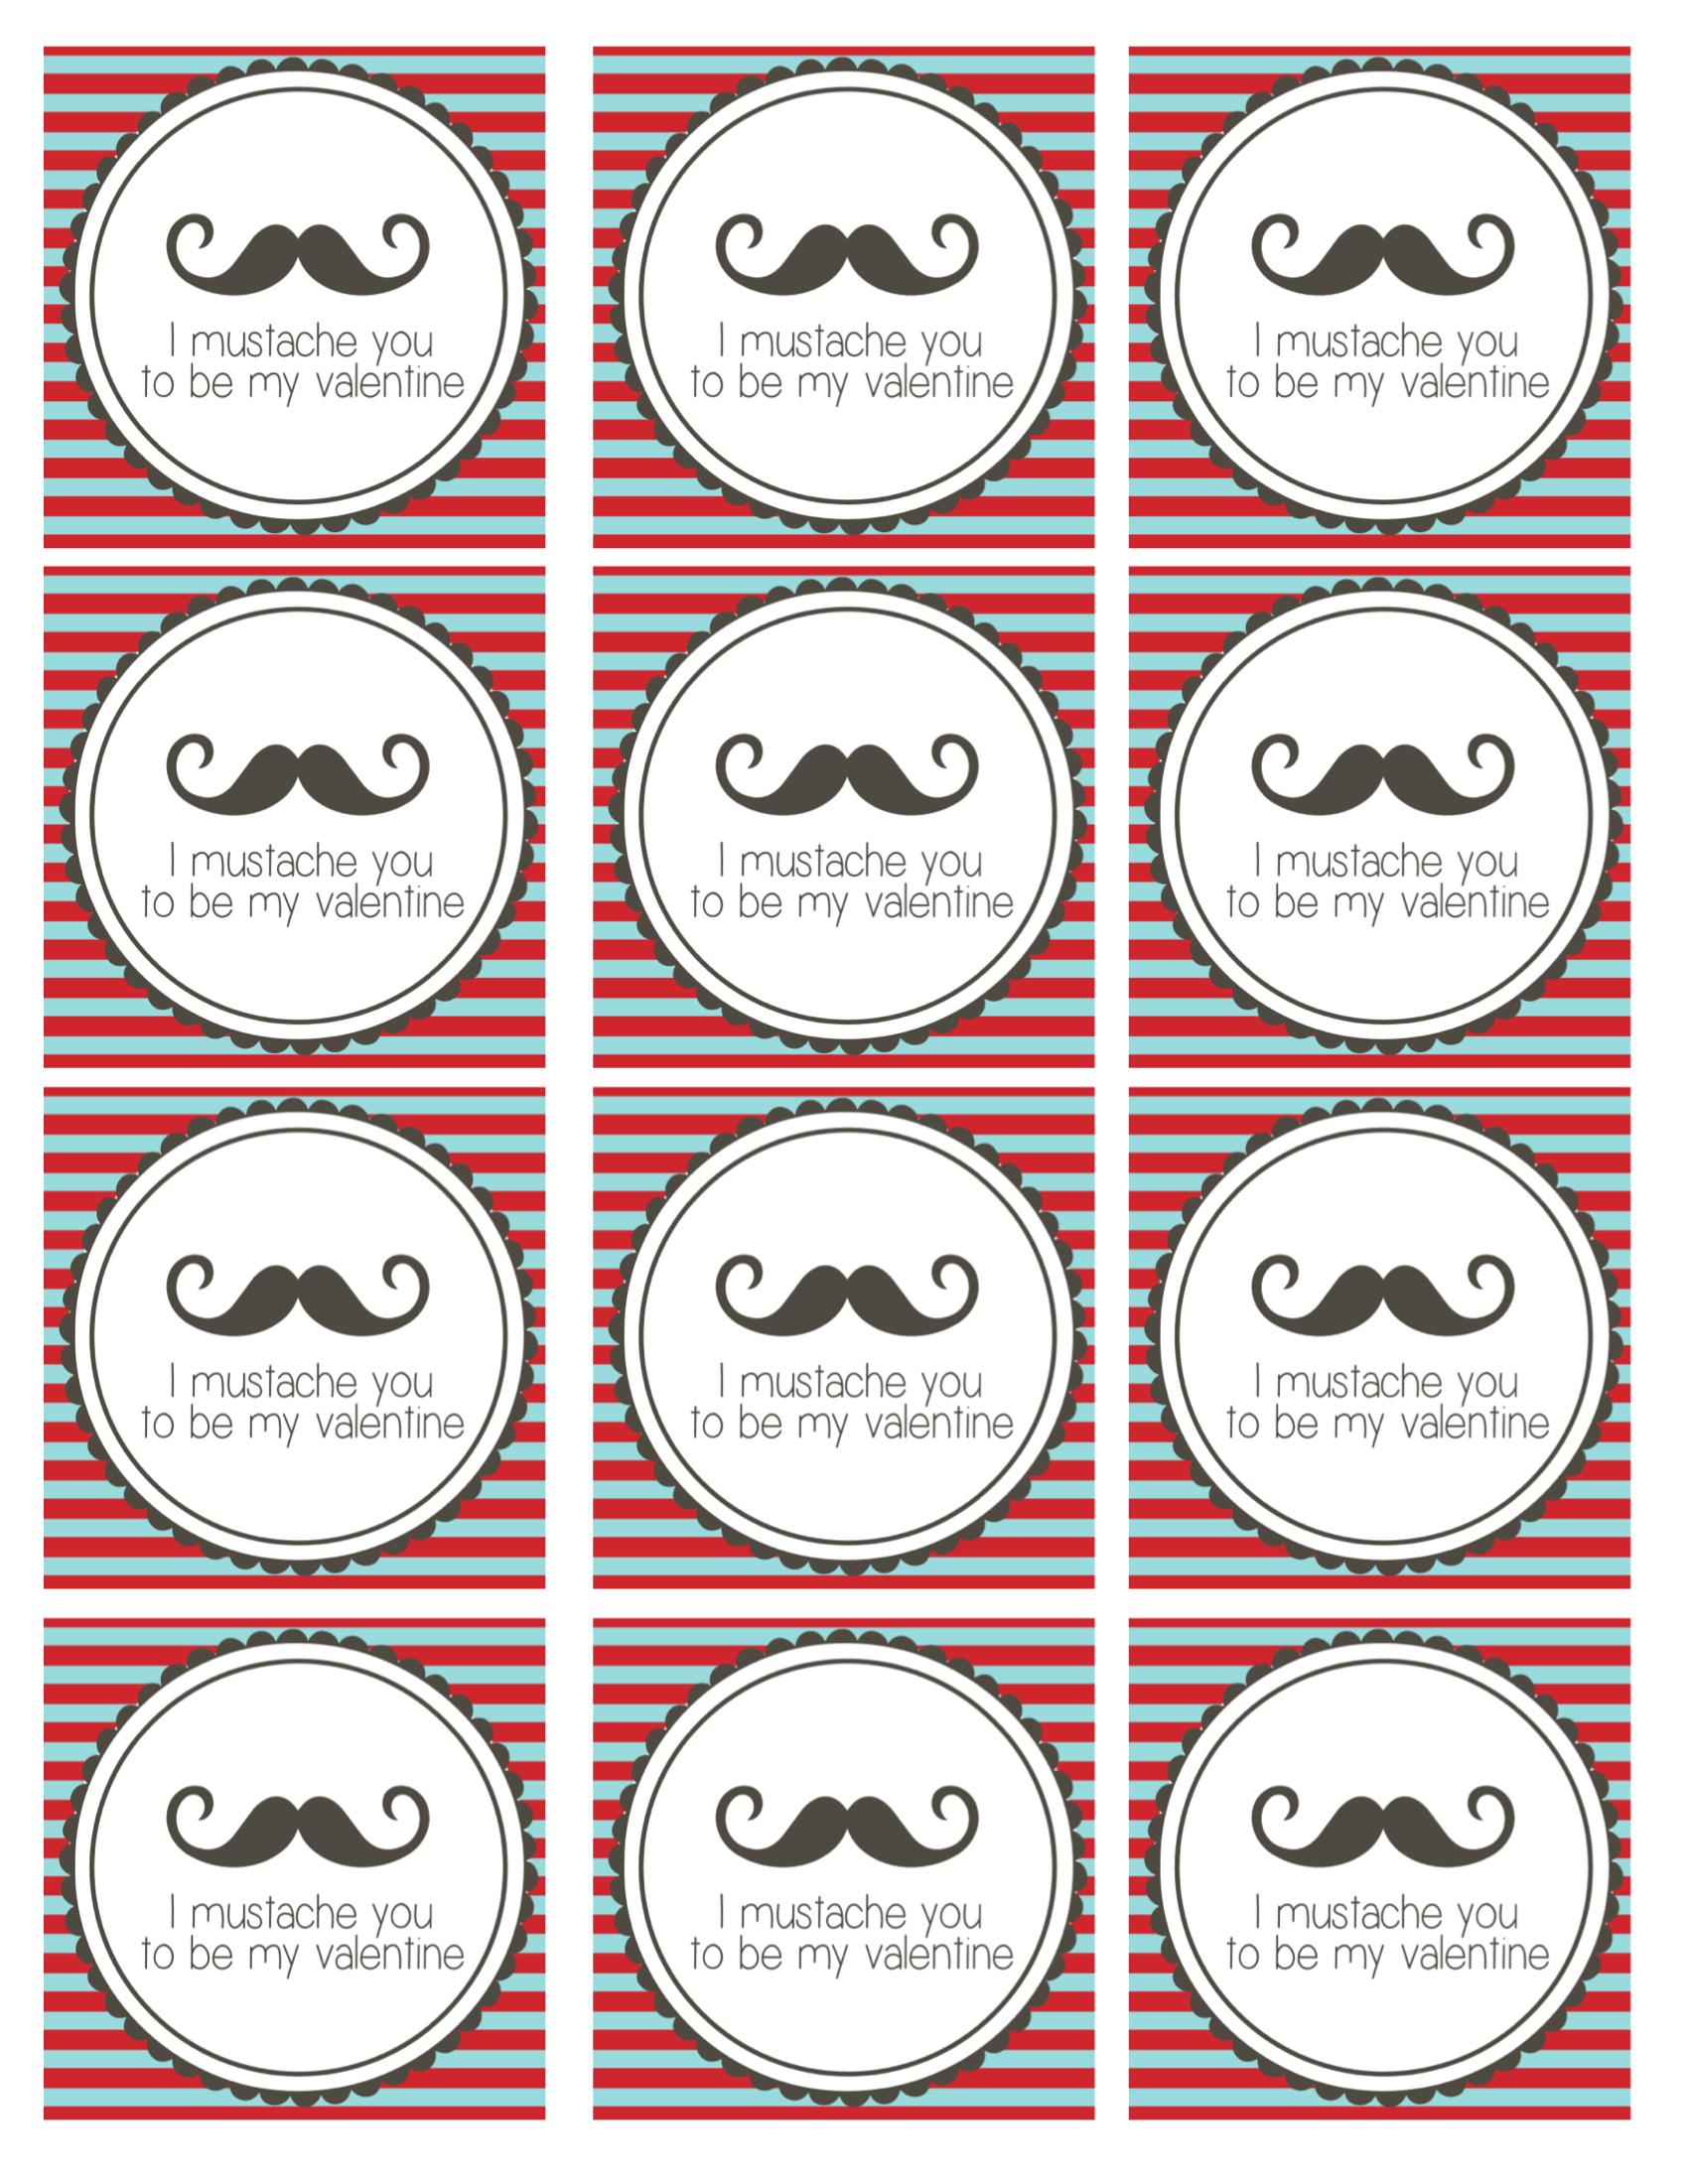 mustache printables